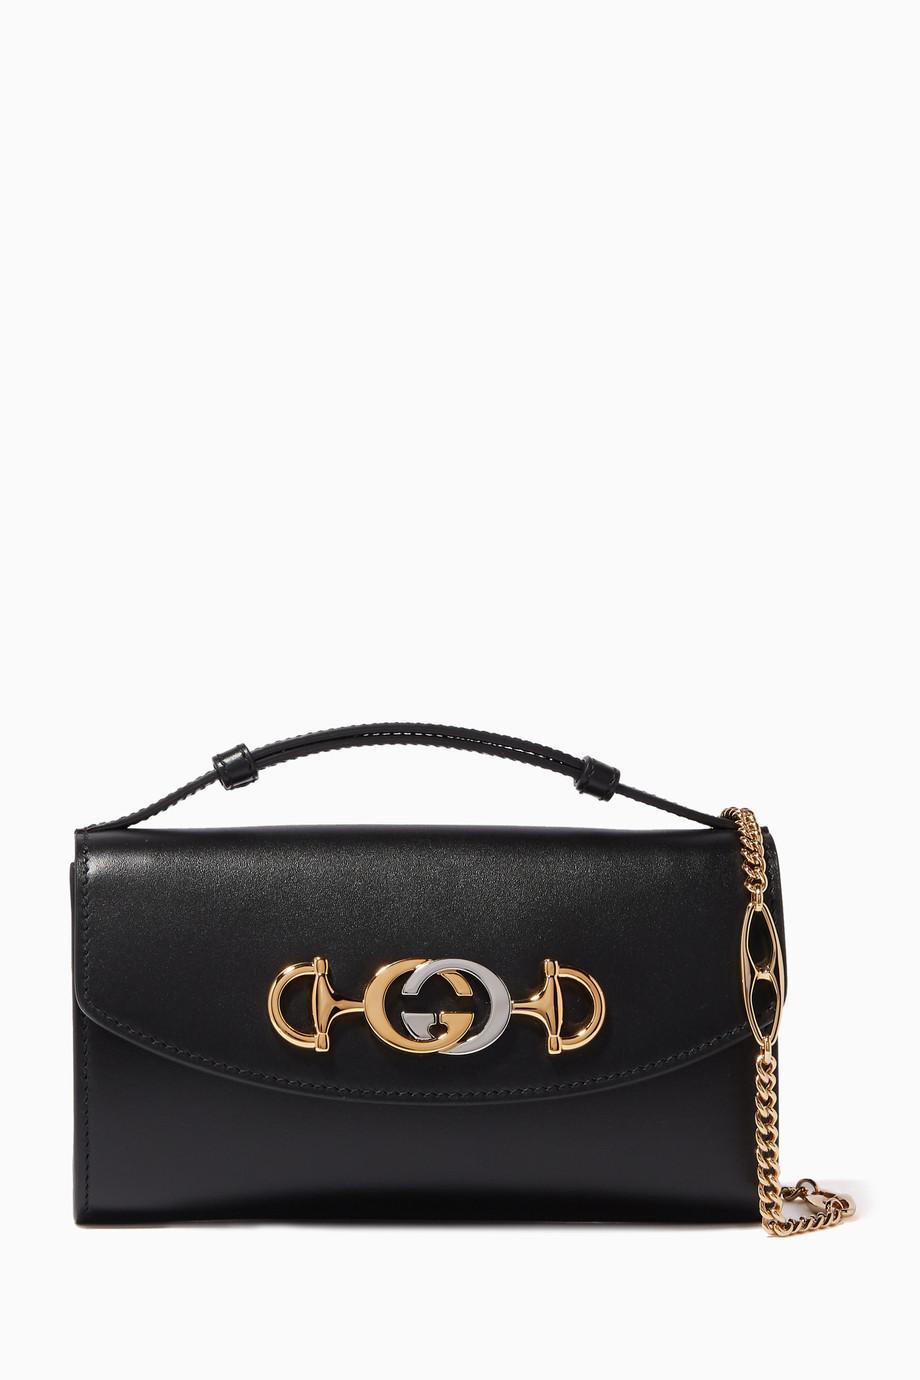 36c4674fc074 Shop Gucci Black Zumi Mini Leather Cross-Body Bag for Women